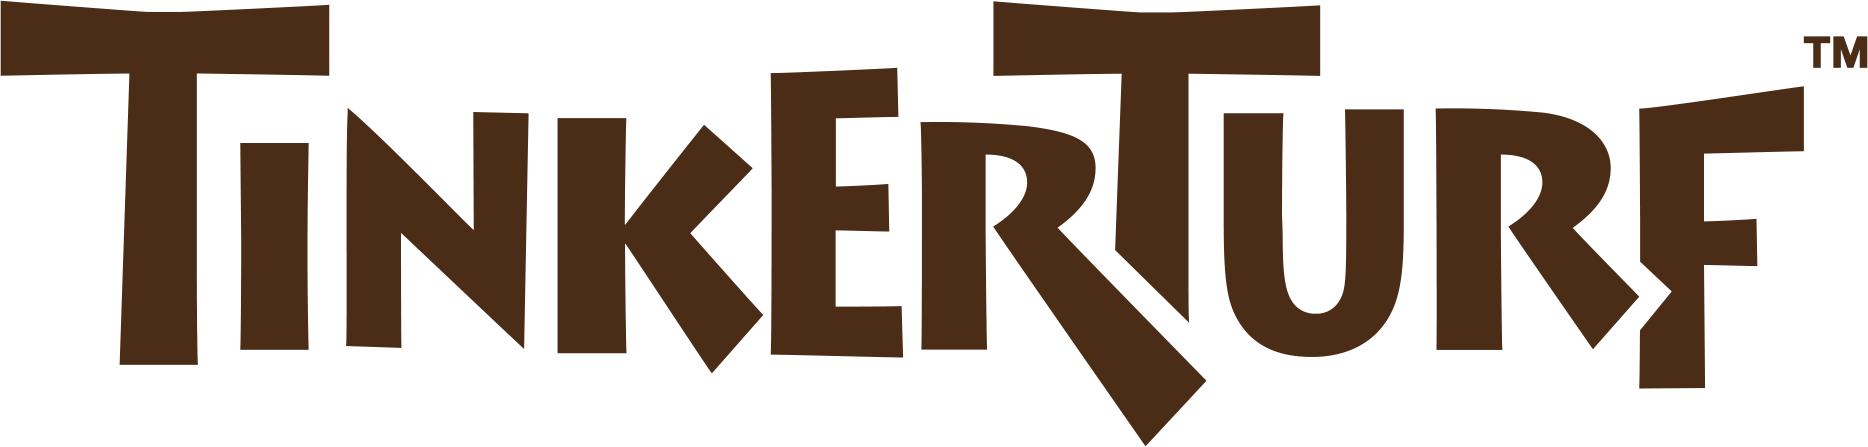 TinkerTurf Logo